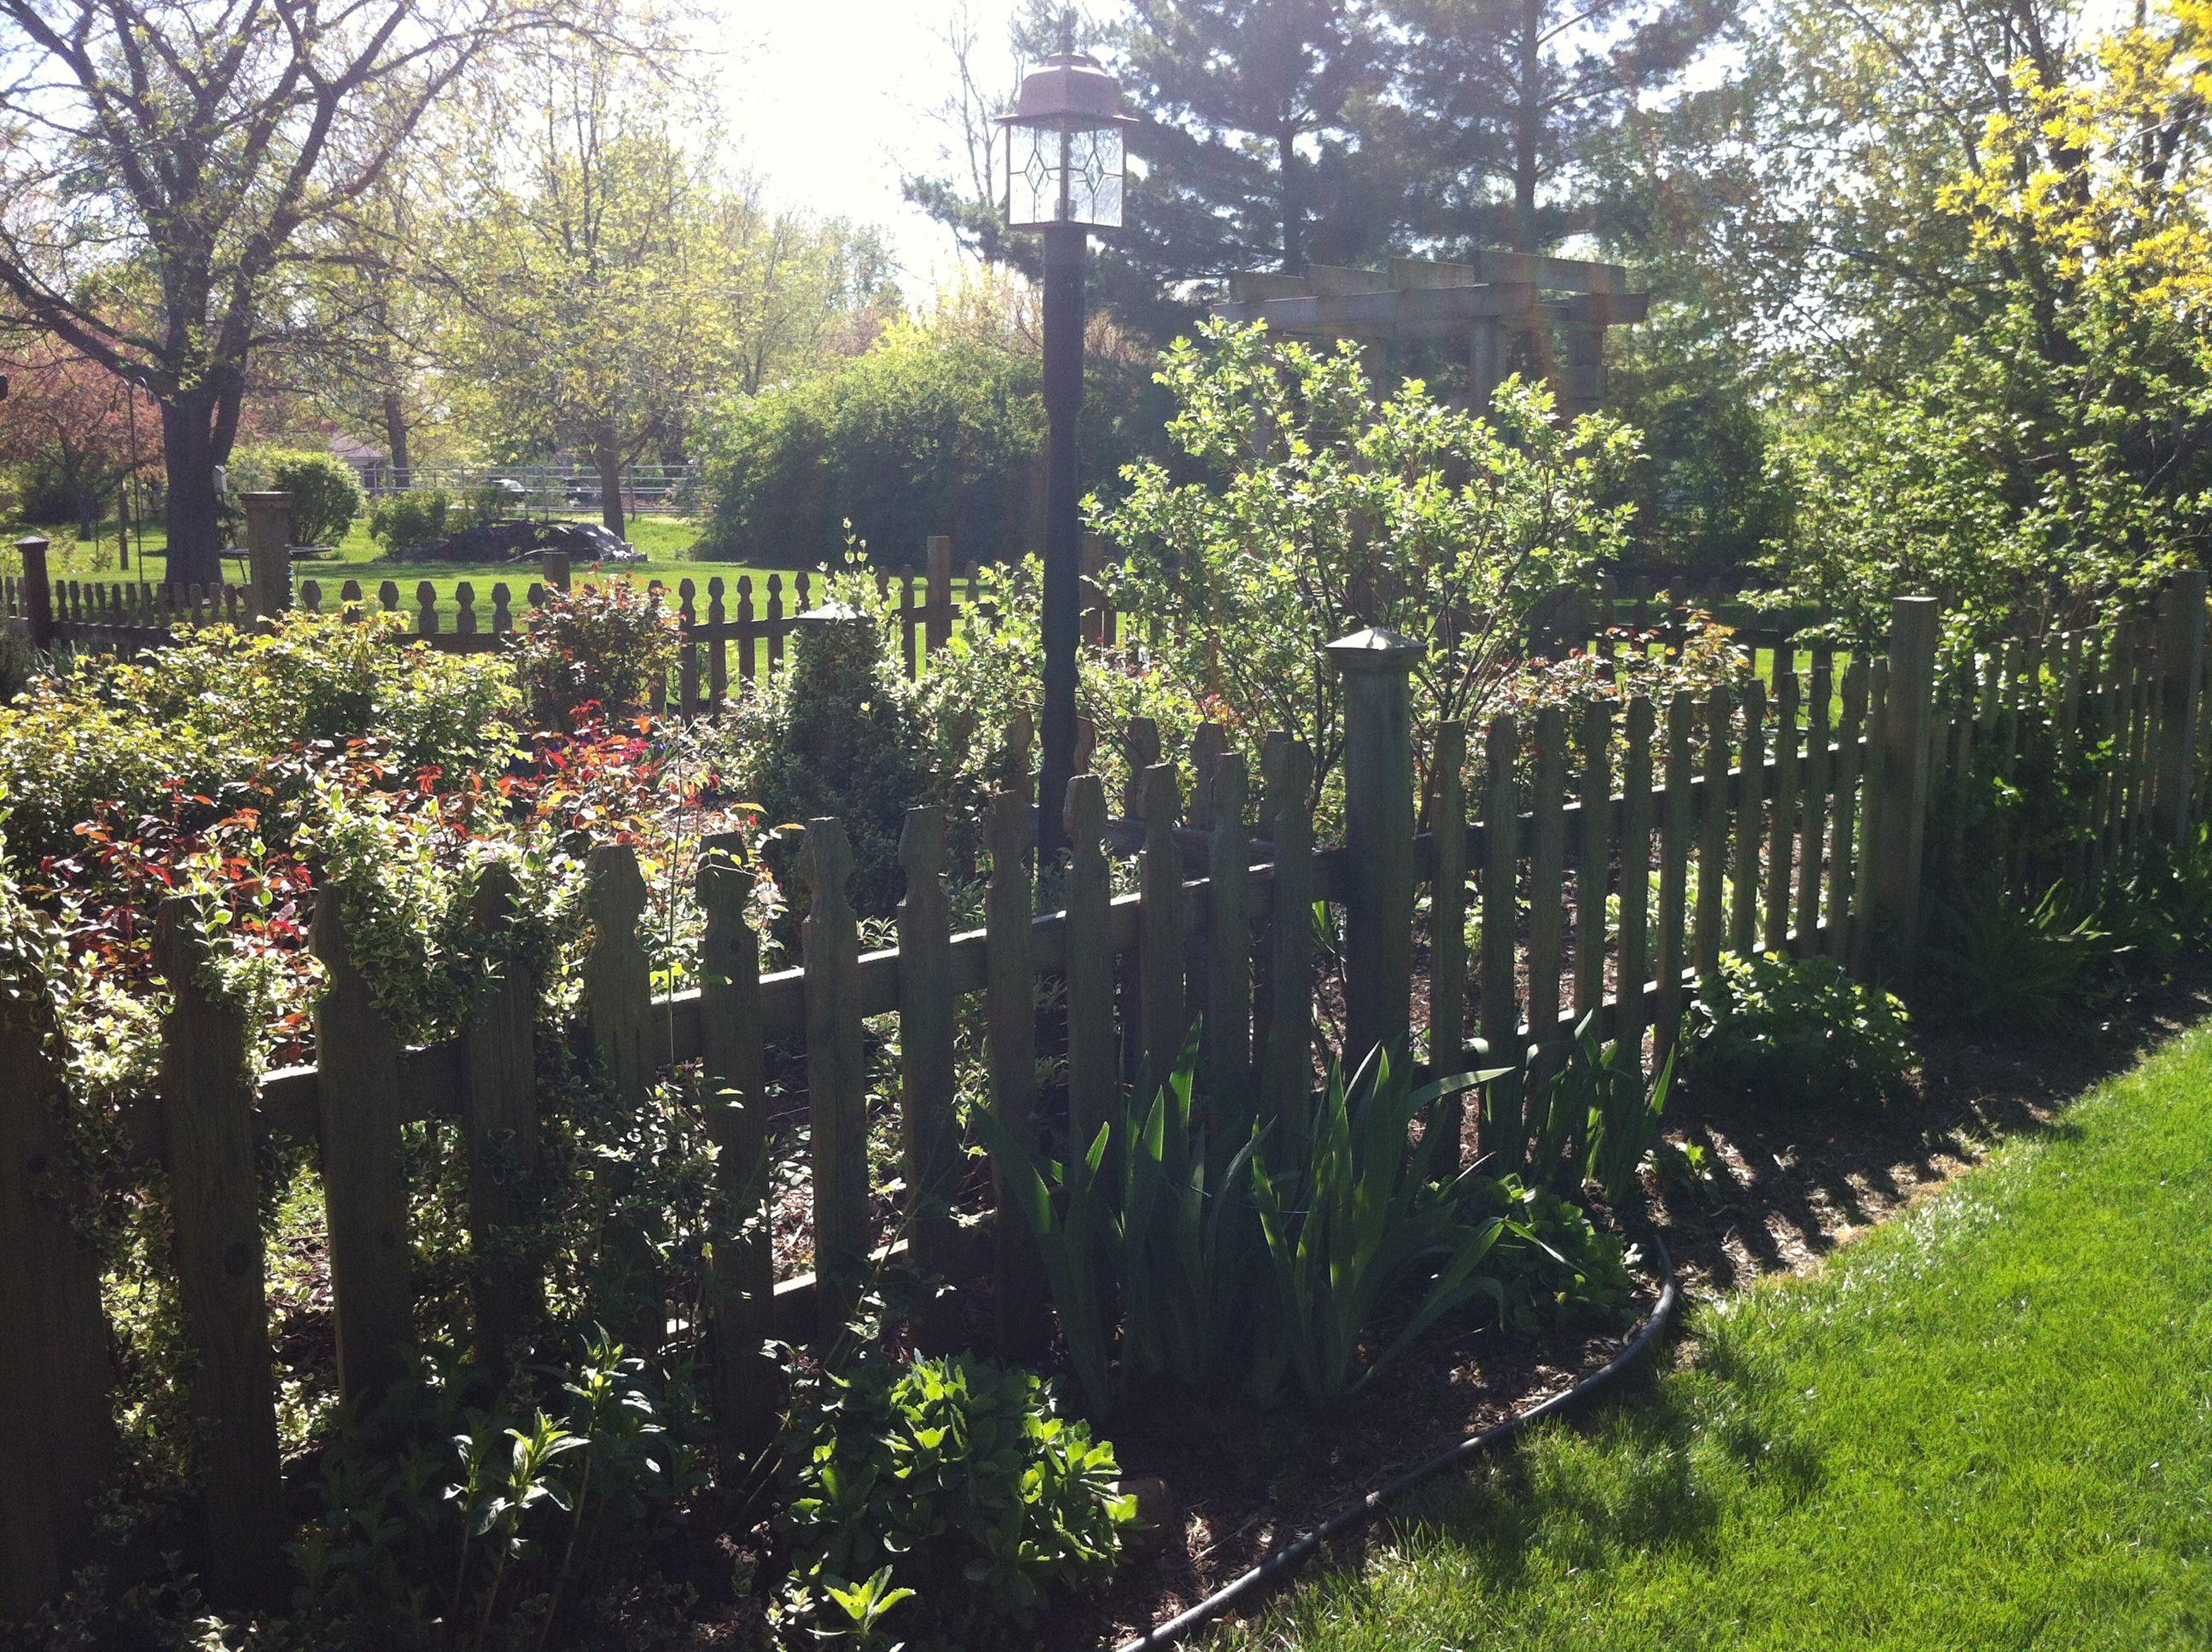 Garden Walk Buffalo Through The Garden Gates 6: Can't Believe It Is April 6, 2012 .... Early Spring!A Walk